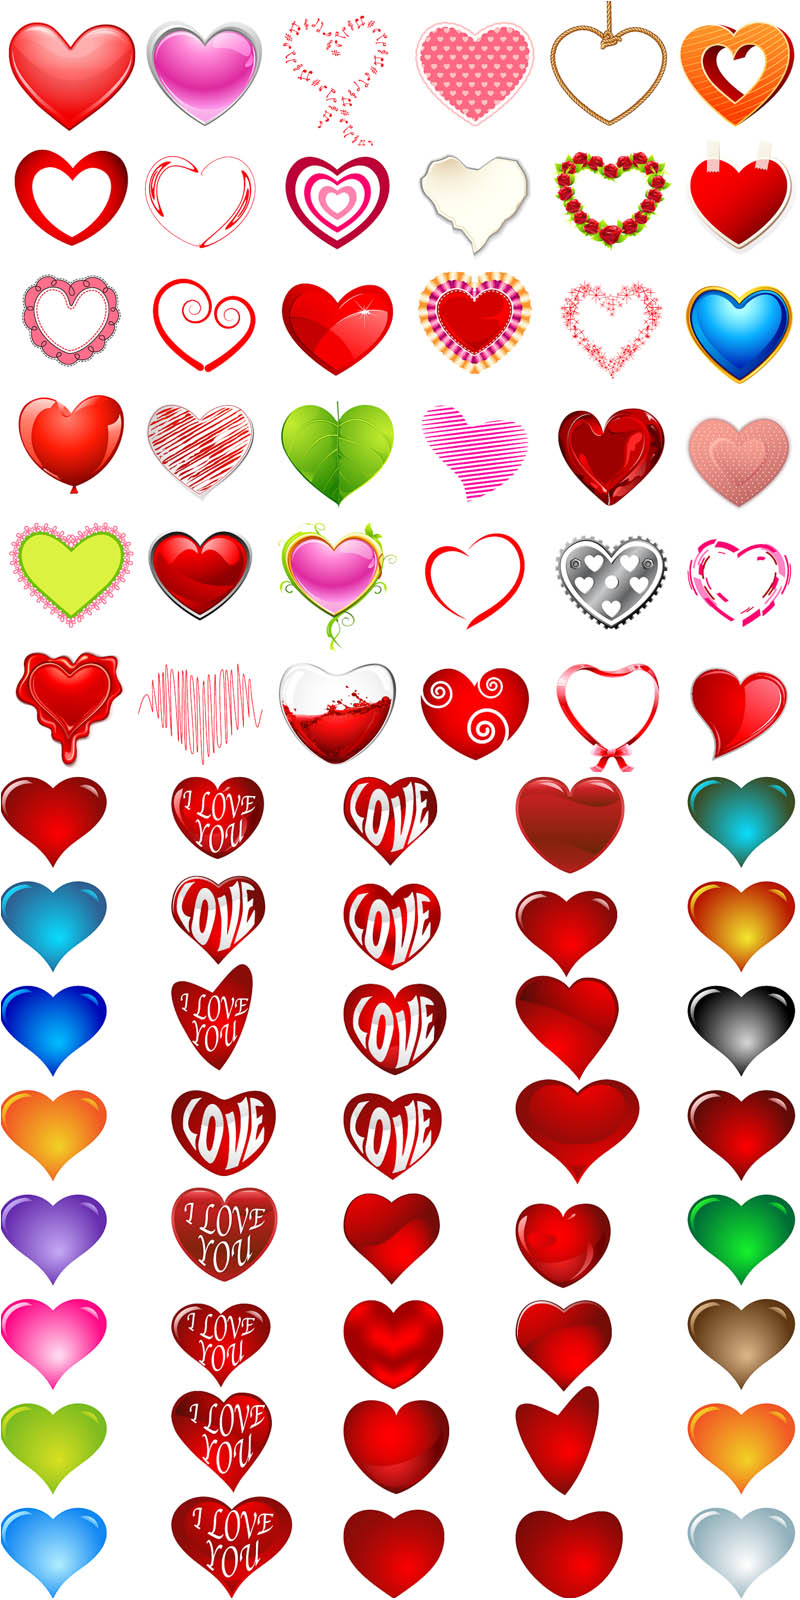 Cartoon Heart with Love